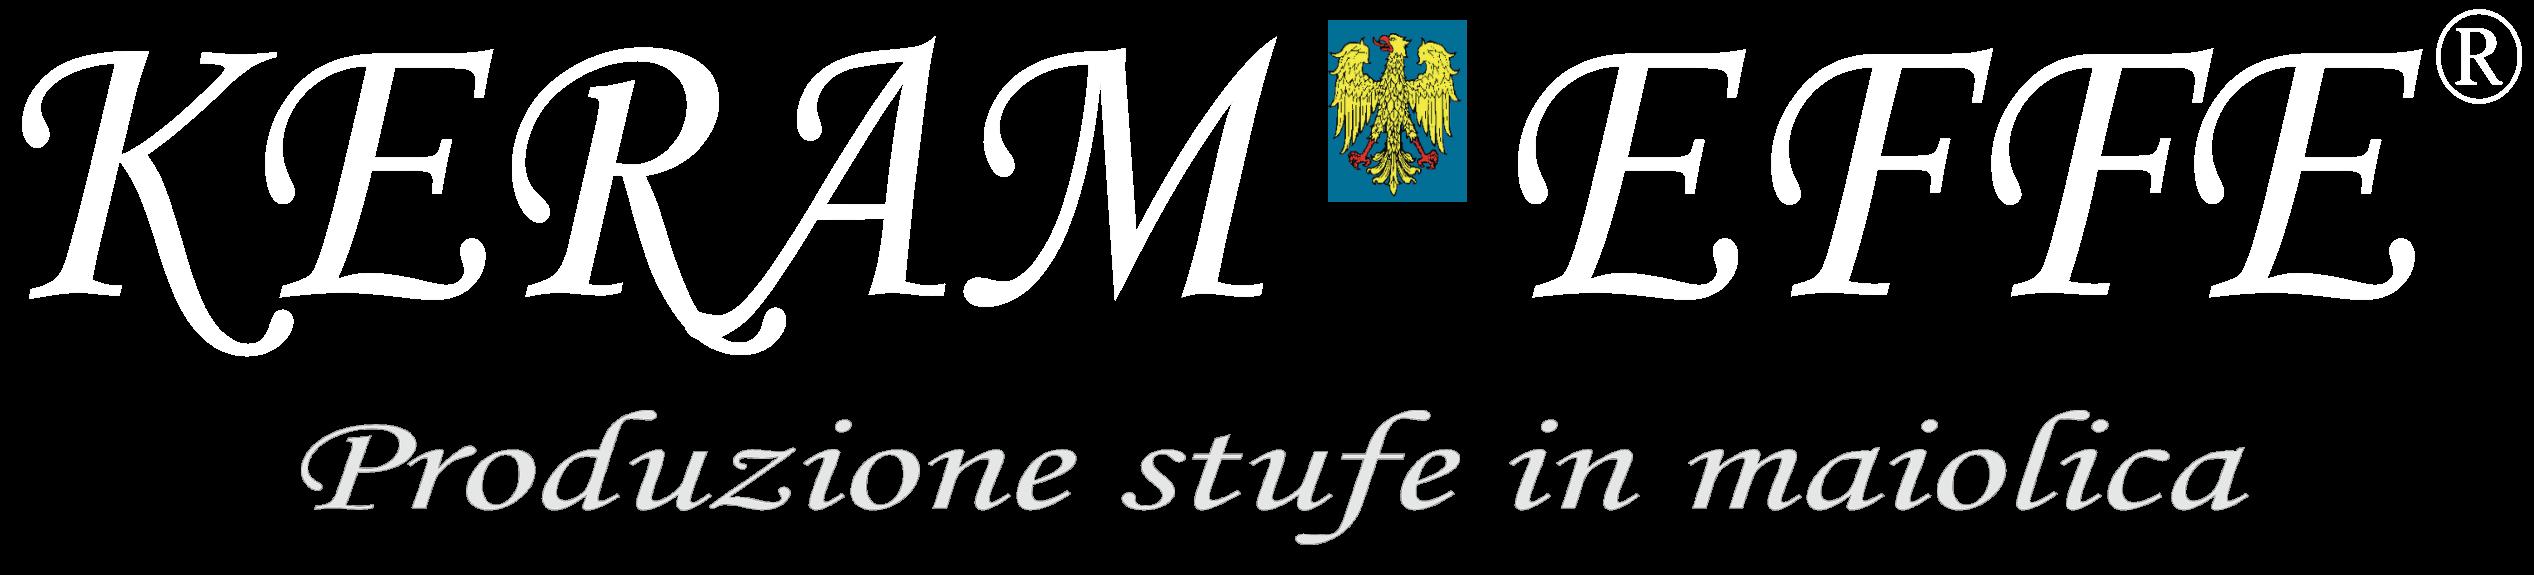 Keram Effe Logo White